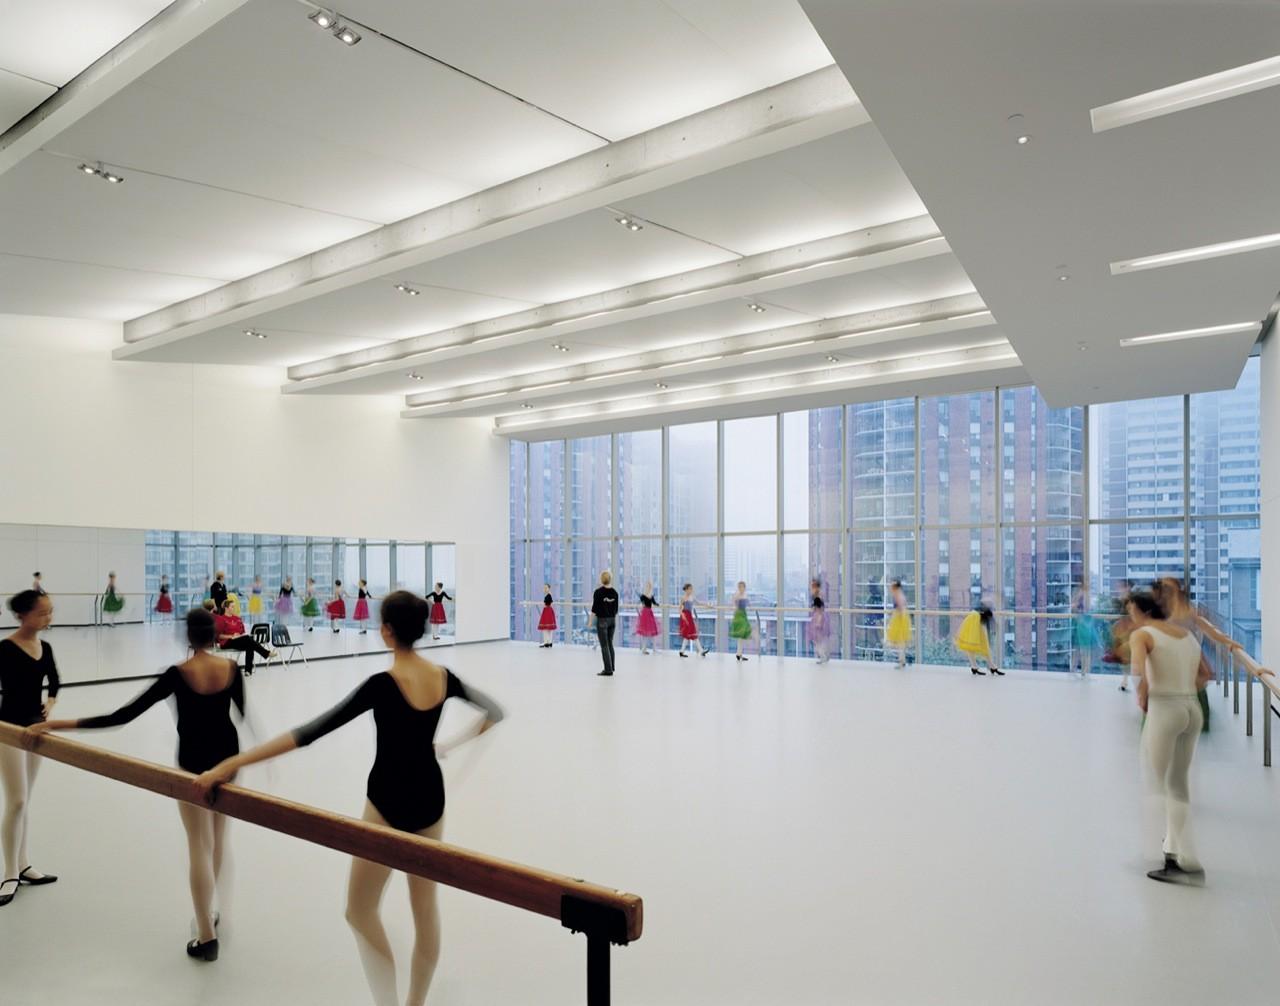 Gallery of the national ballet school kpmb architects 16 for Interior design school toronto